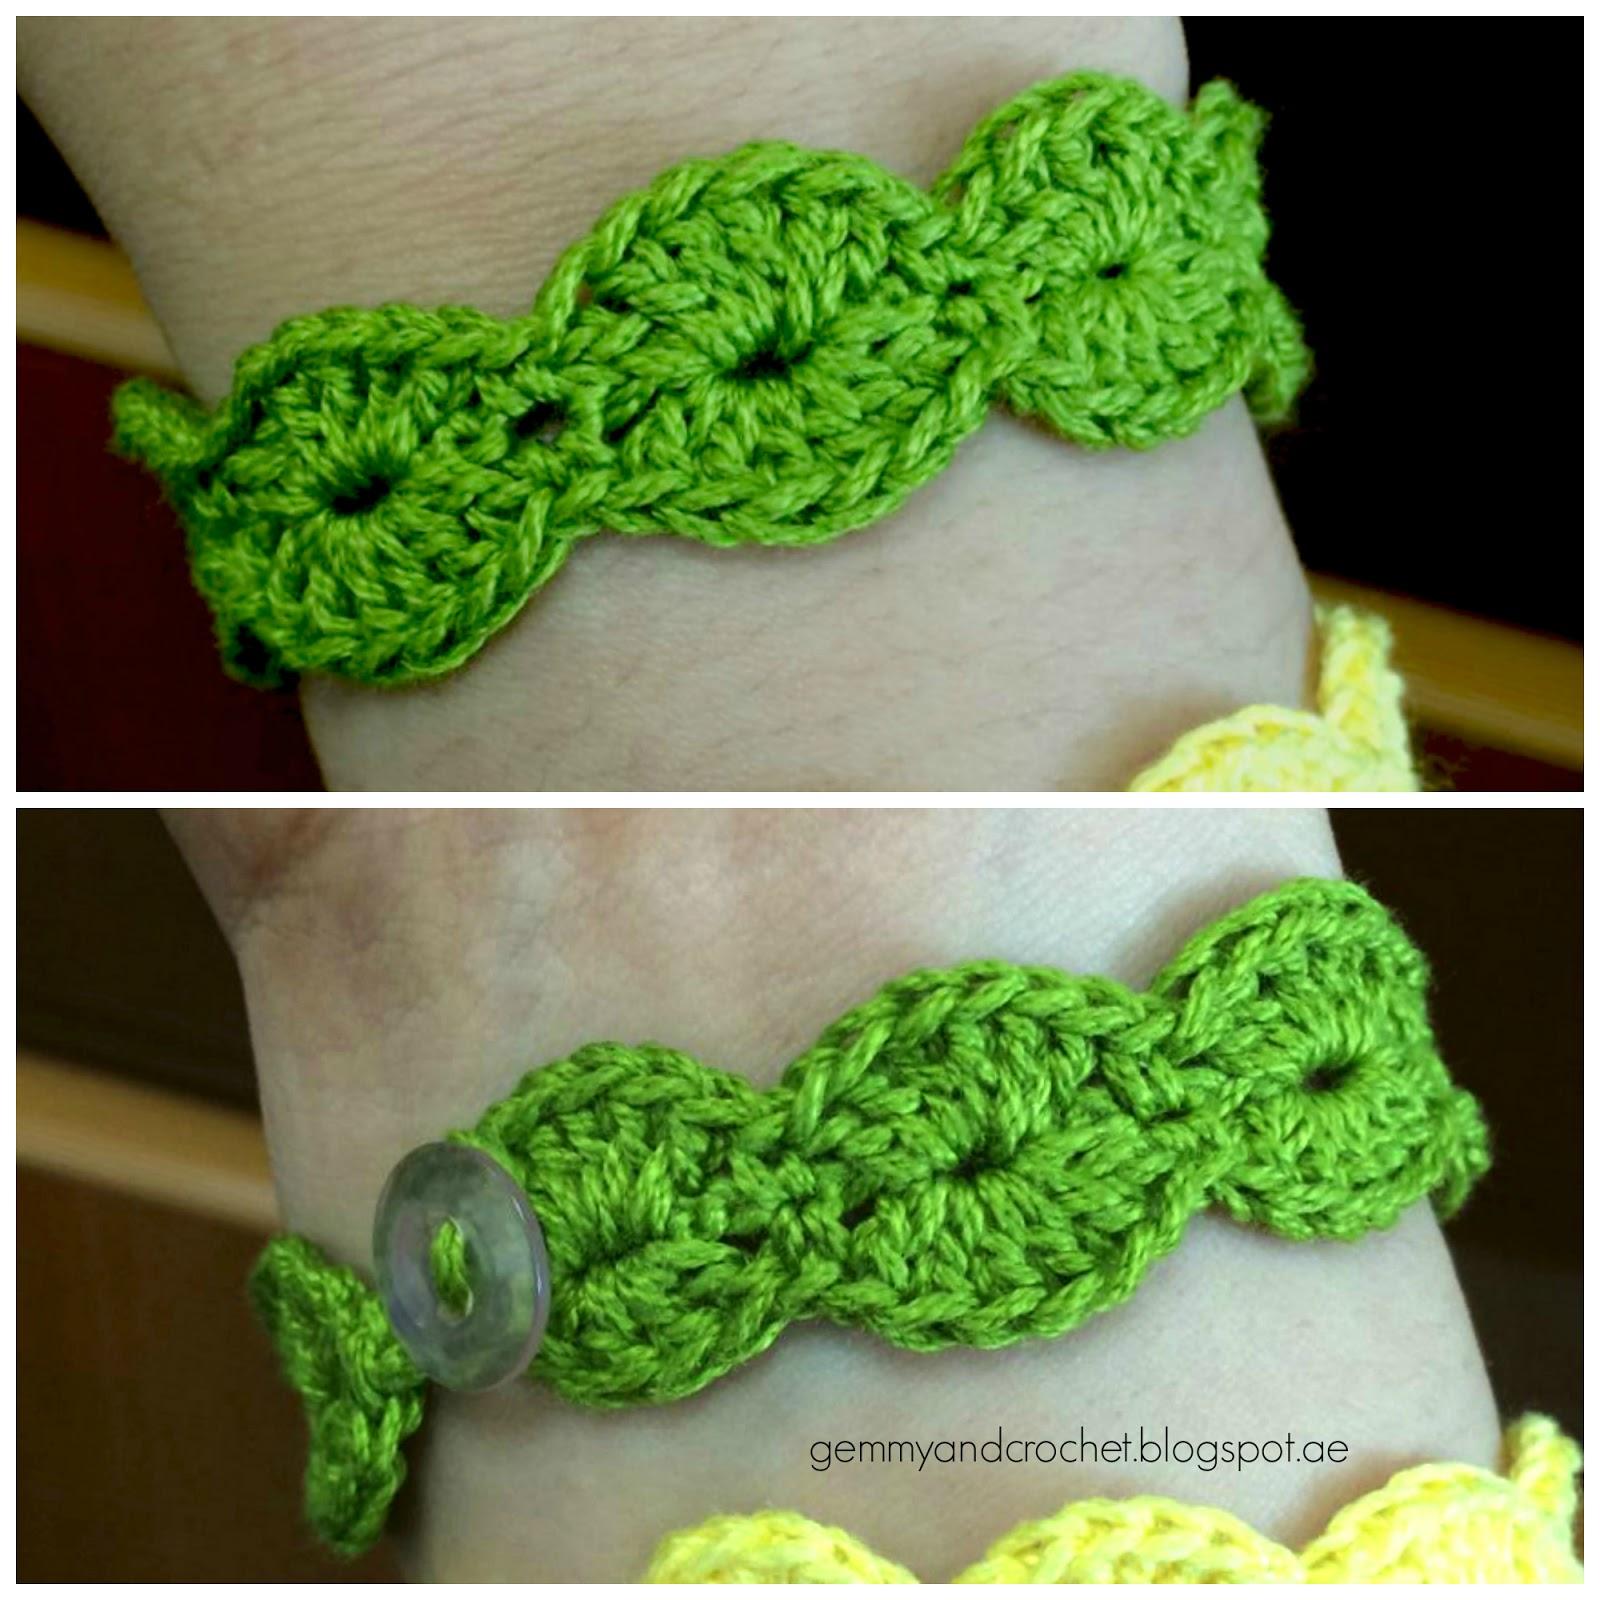 Crochet scallop bracelet, scallop crochet, crochet bracelet, scallop pattern, crochet scallop bracelet pattern